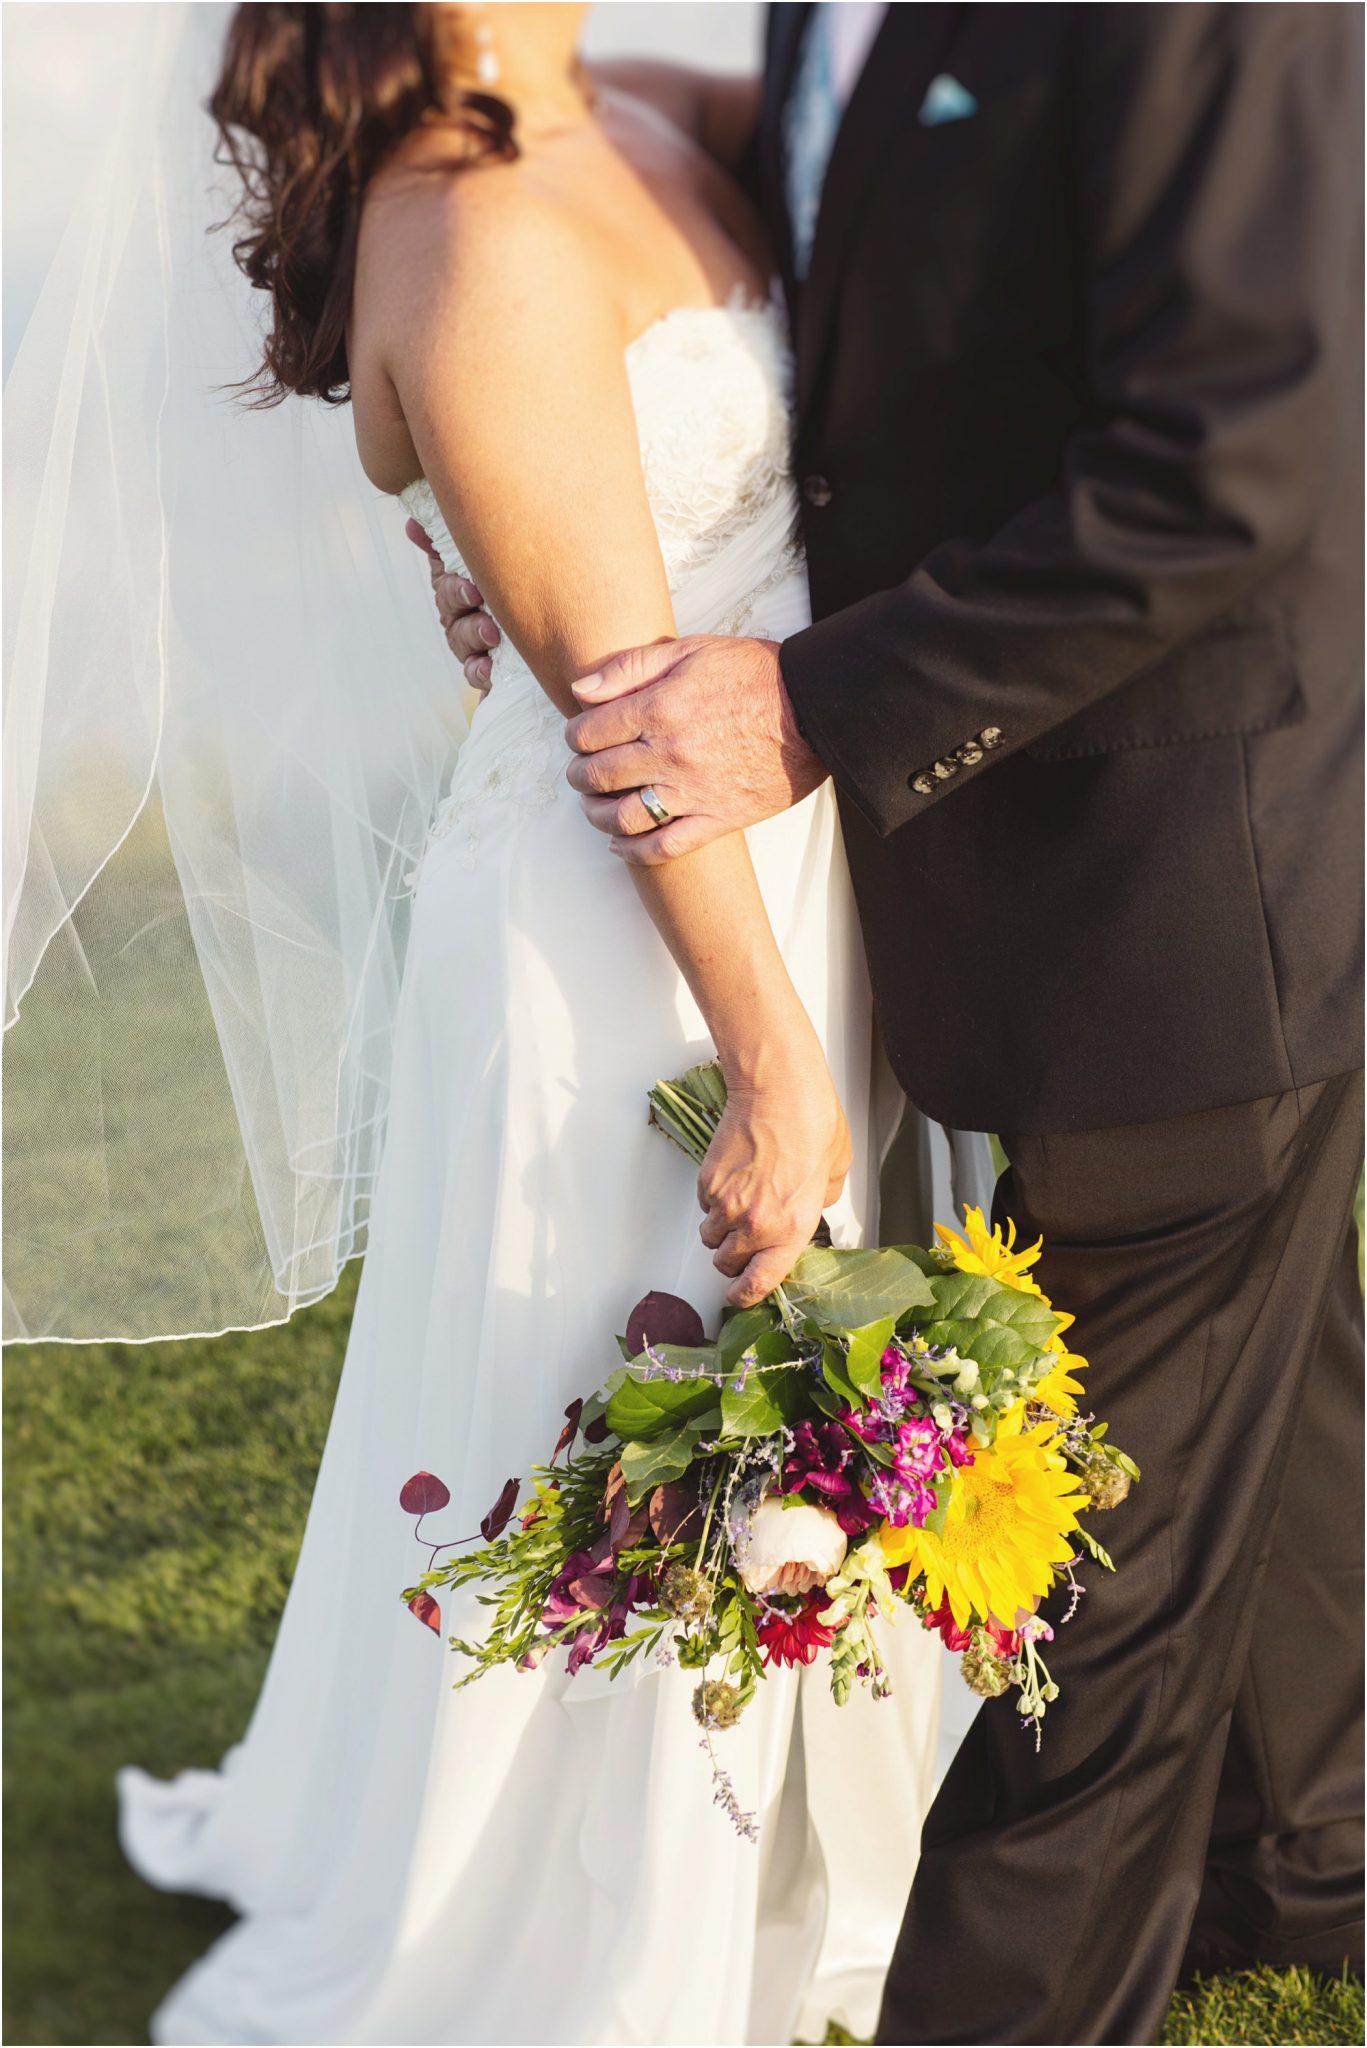 058BlueRosePhotography_ Albuquerque wedding photographers